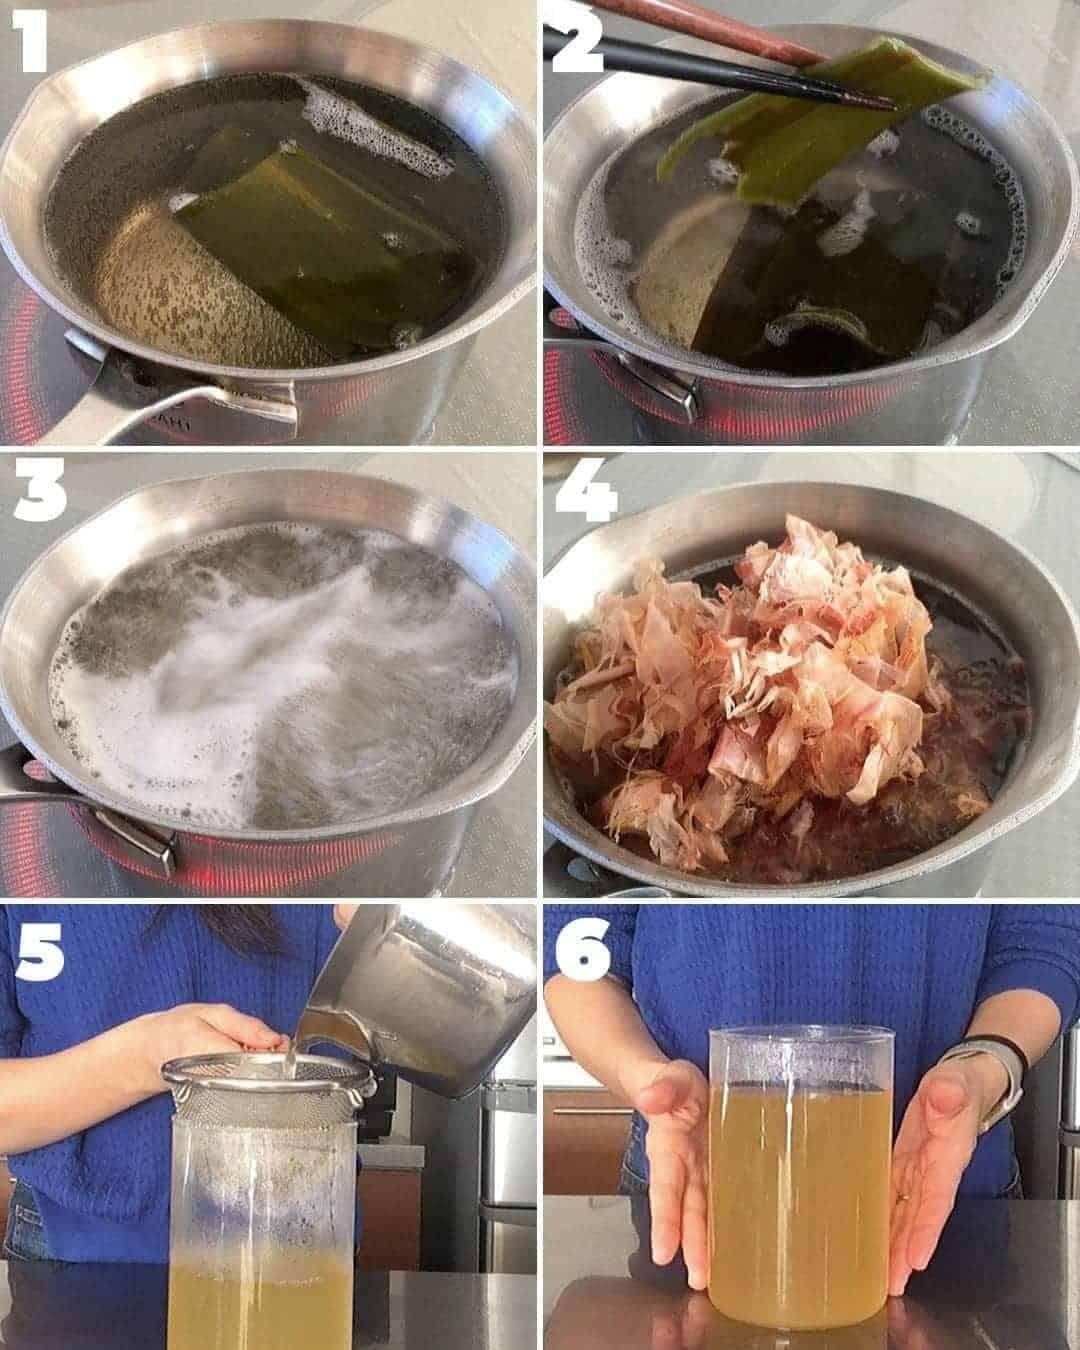 how to make awase dashi(basic Japanese stock)